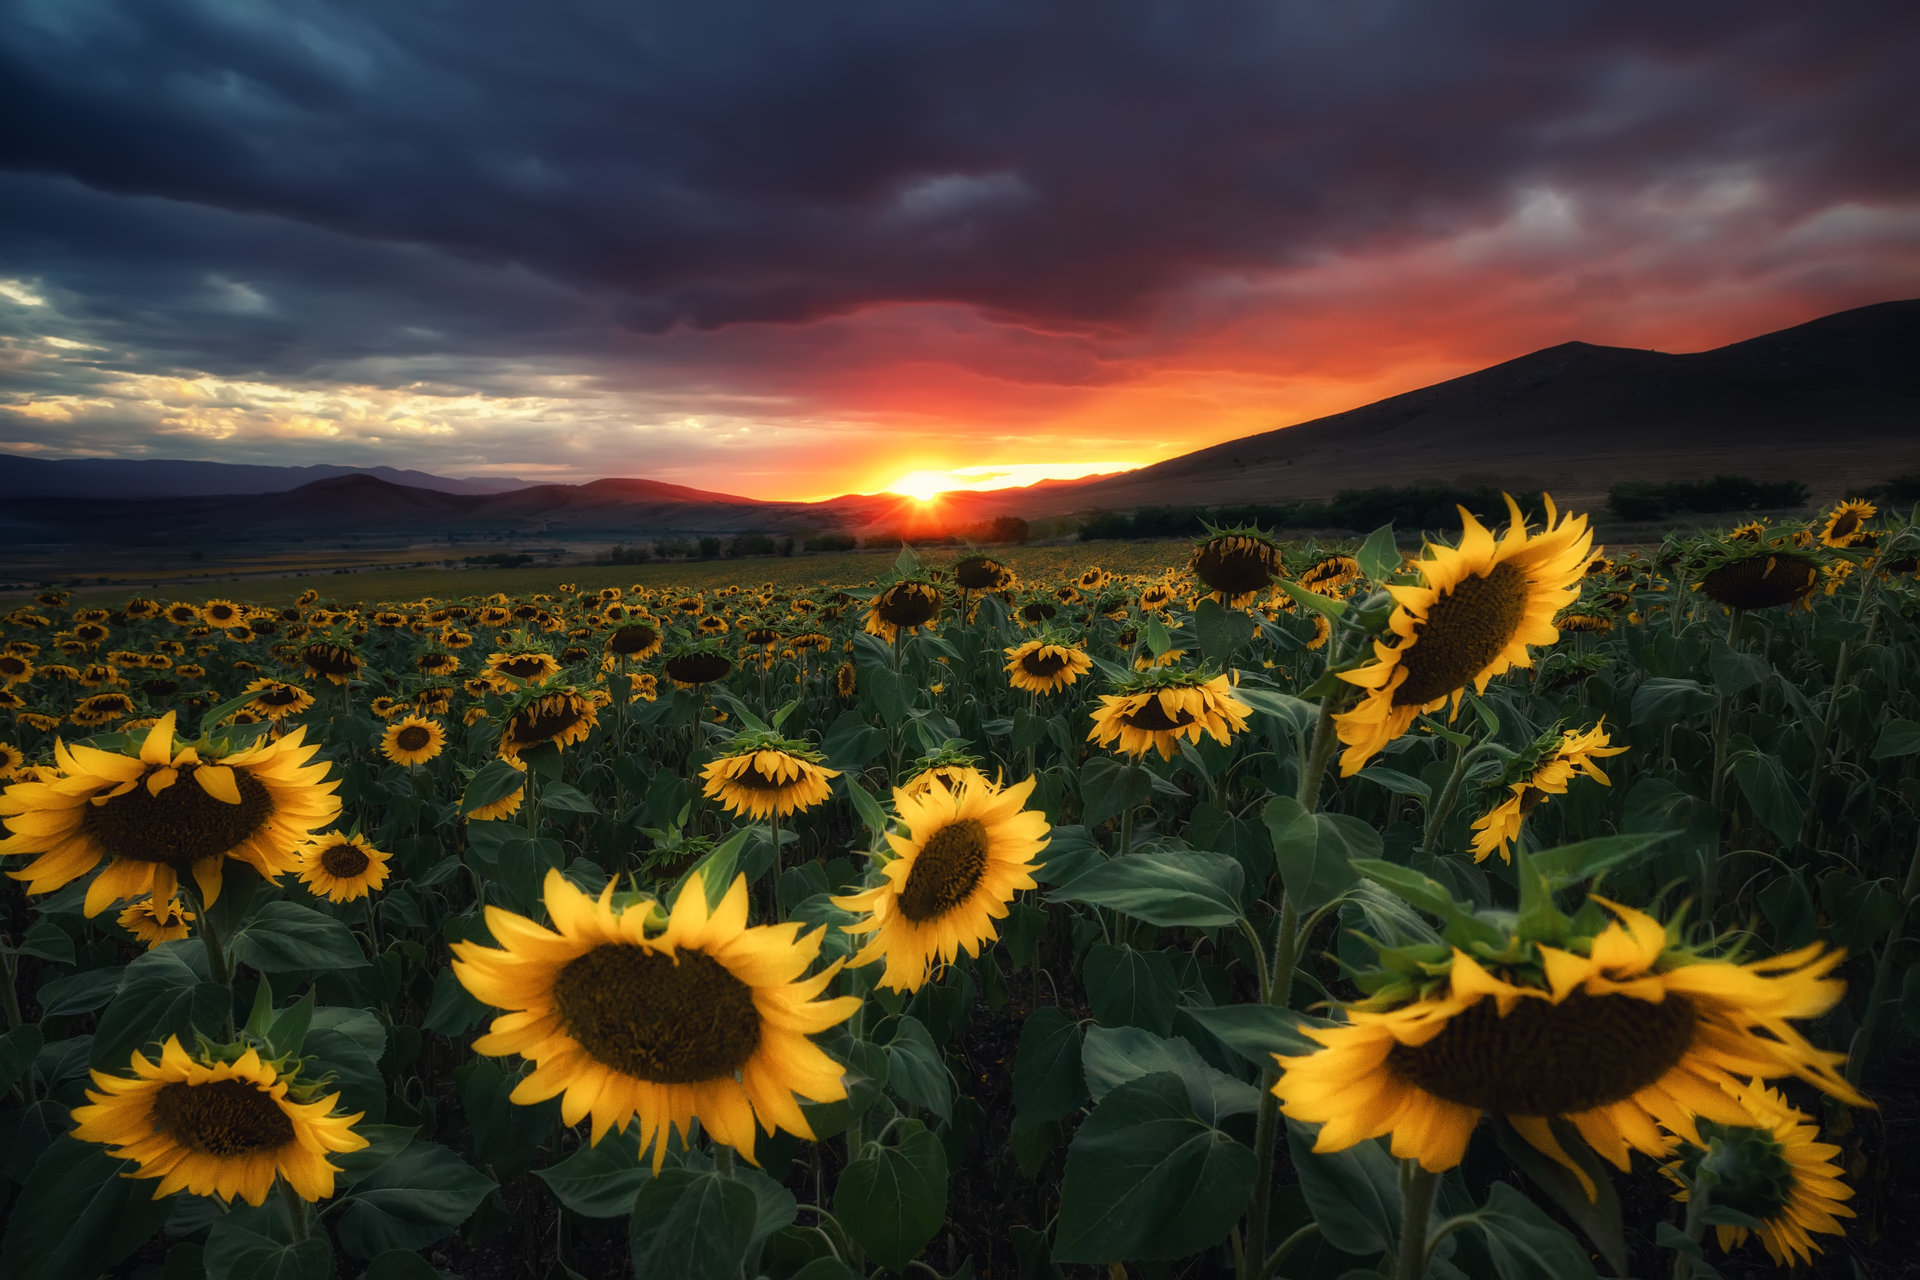 Photo in Landscape | Author Kostadin Madzharov - _koko_ | PHOTO FORUM